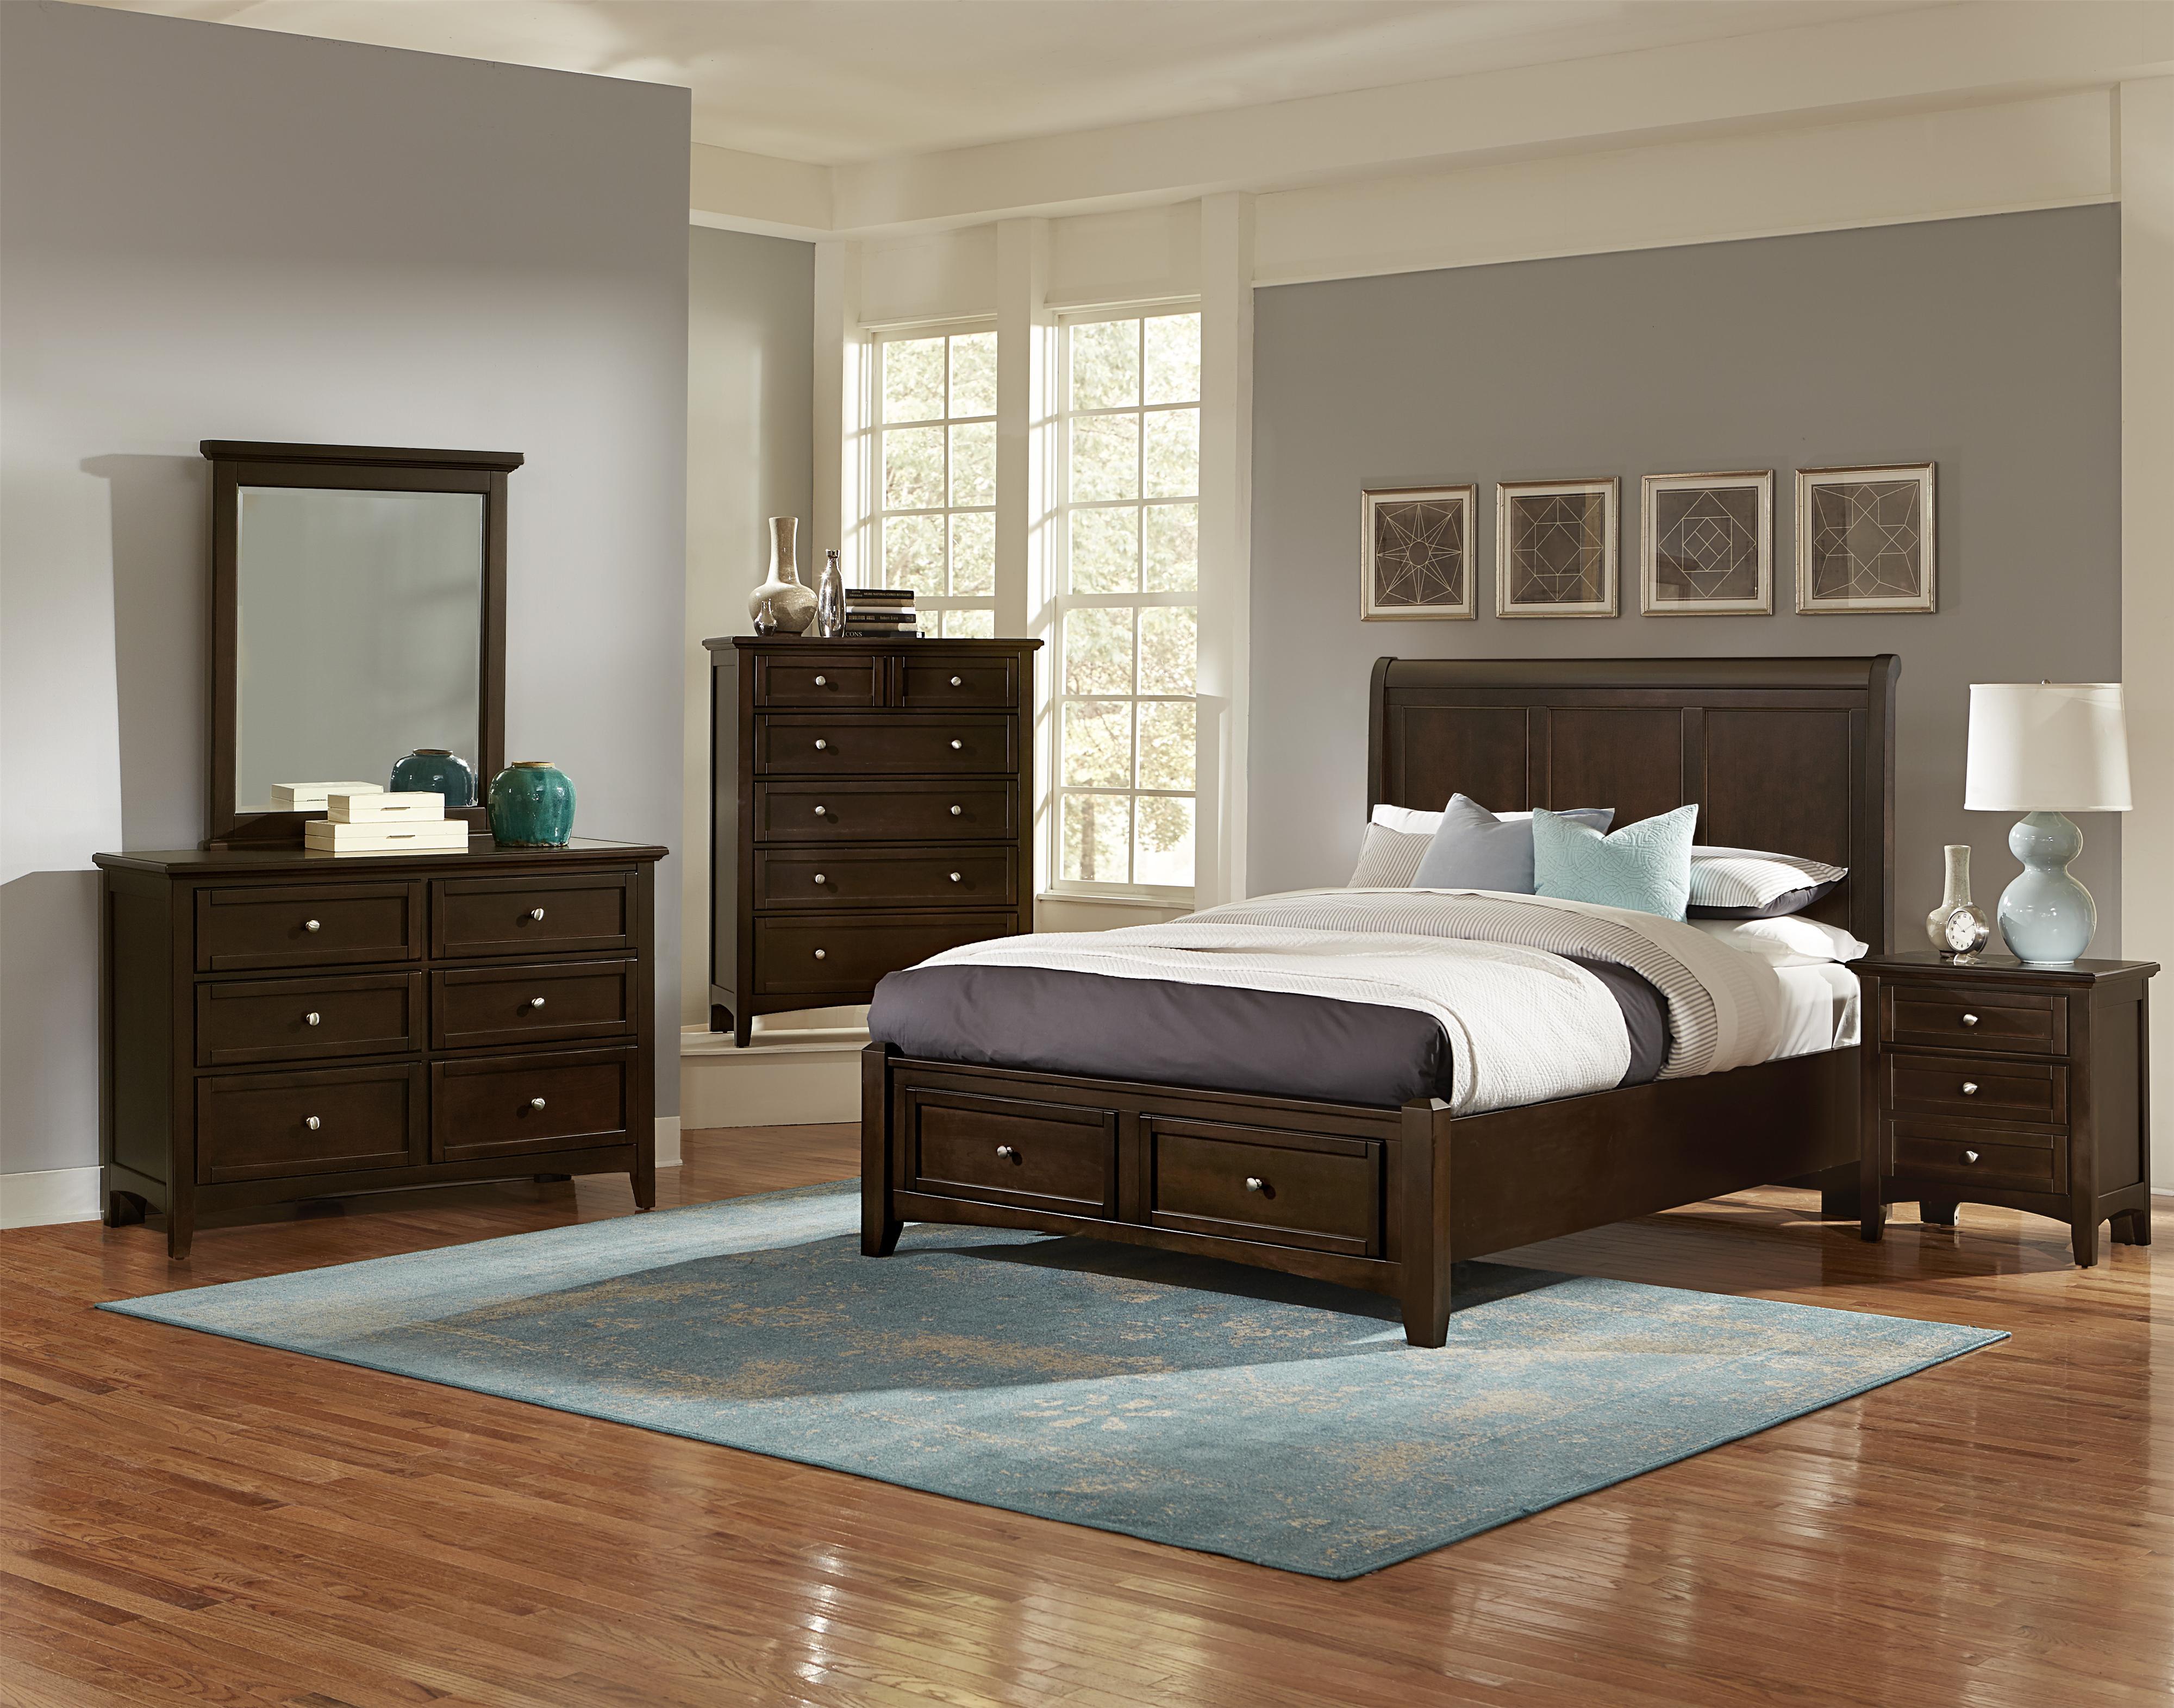 Bonanza Queen Bedroom Group by Vaughan Bassett at Northeast Factory Direct